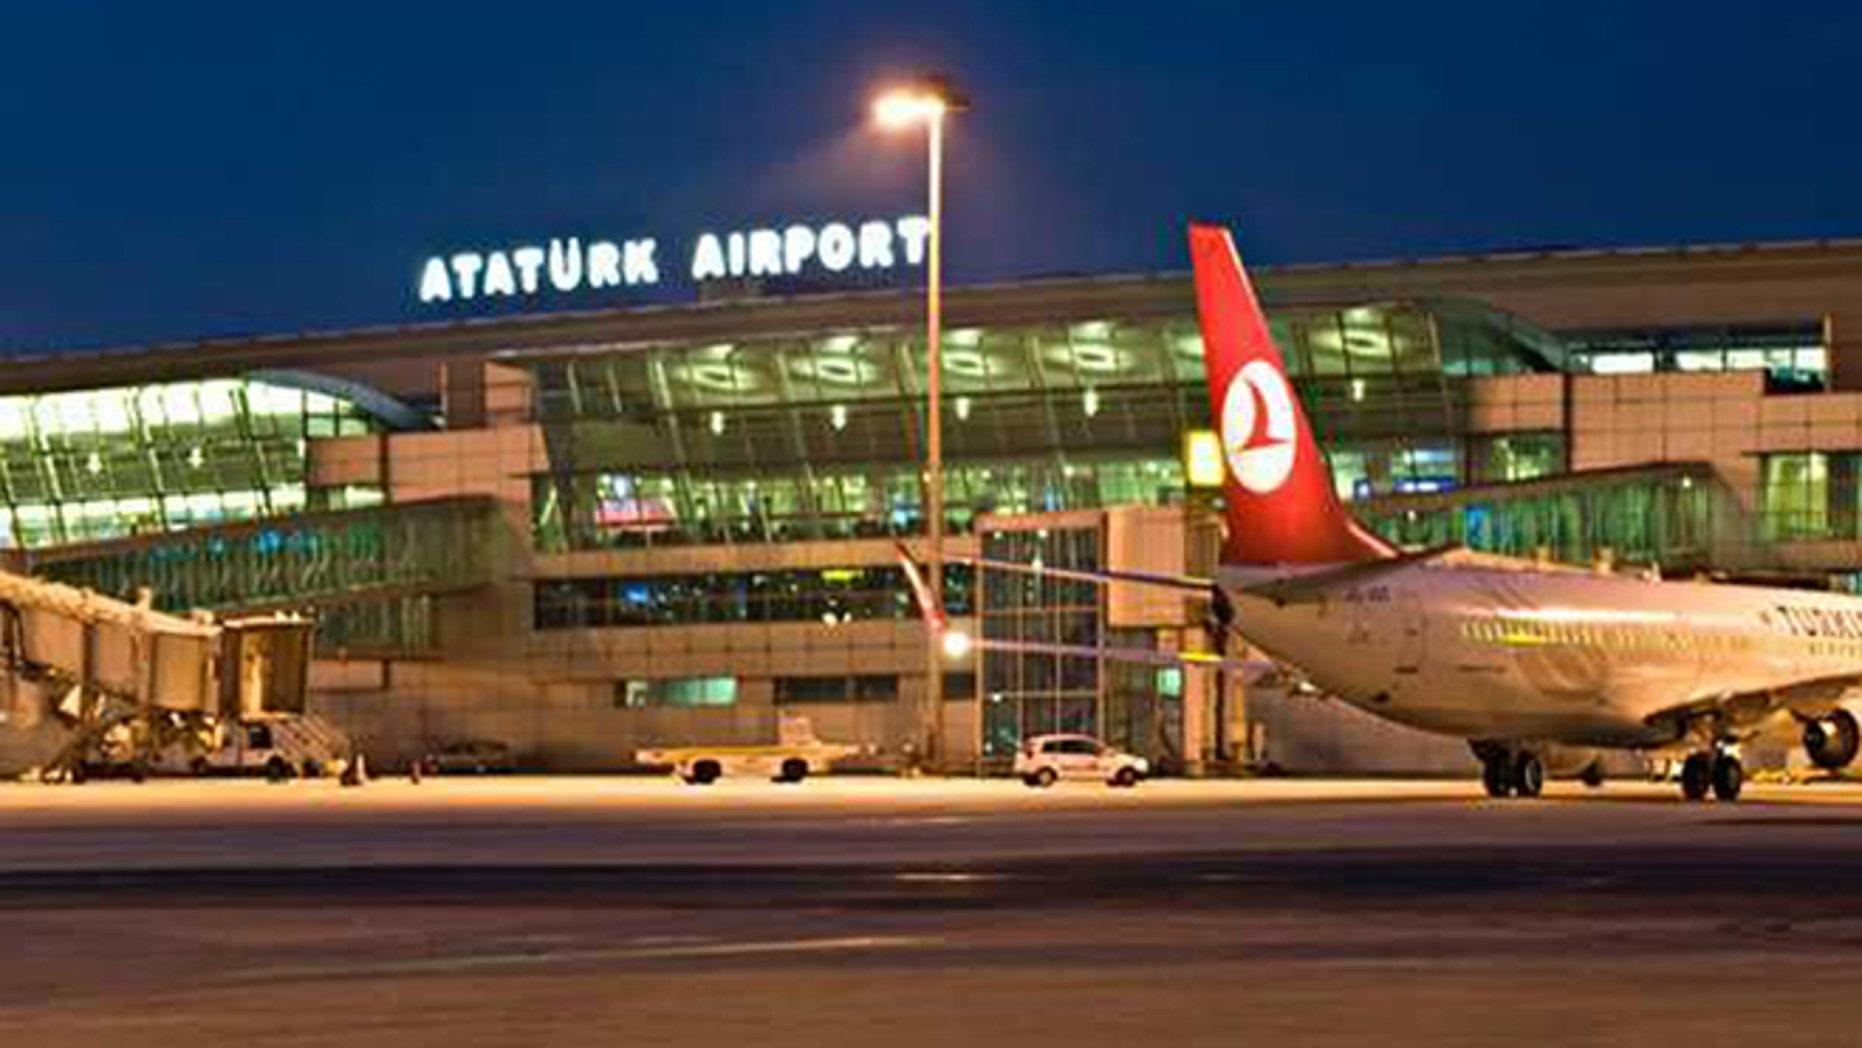 Ataturk Airport is shown.